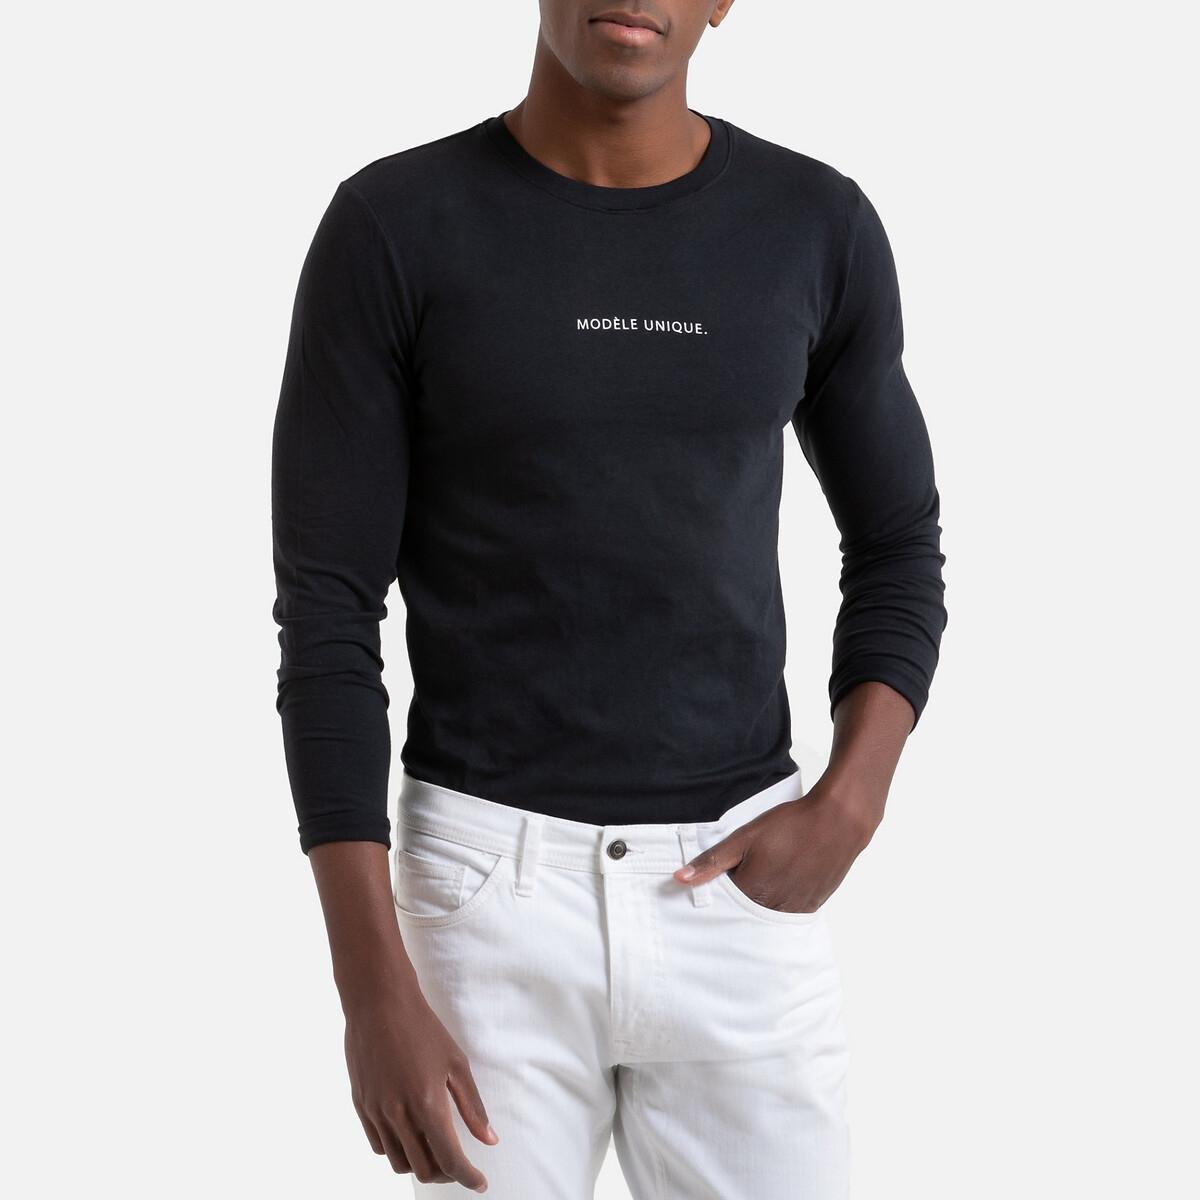 Camisola de gola redonda, mangas compridas, mensagem estampada